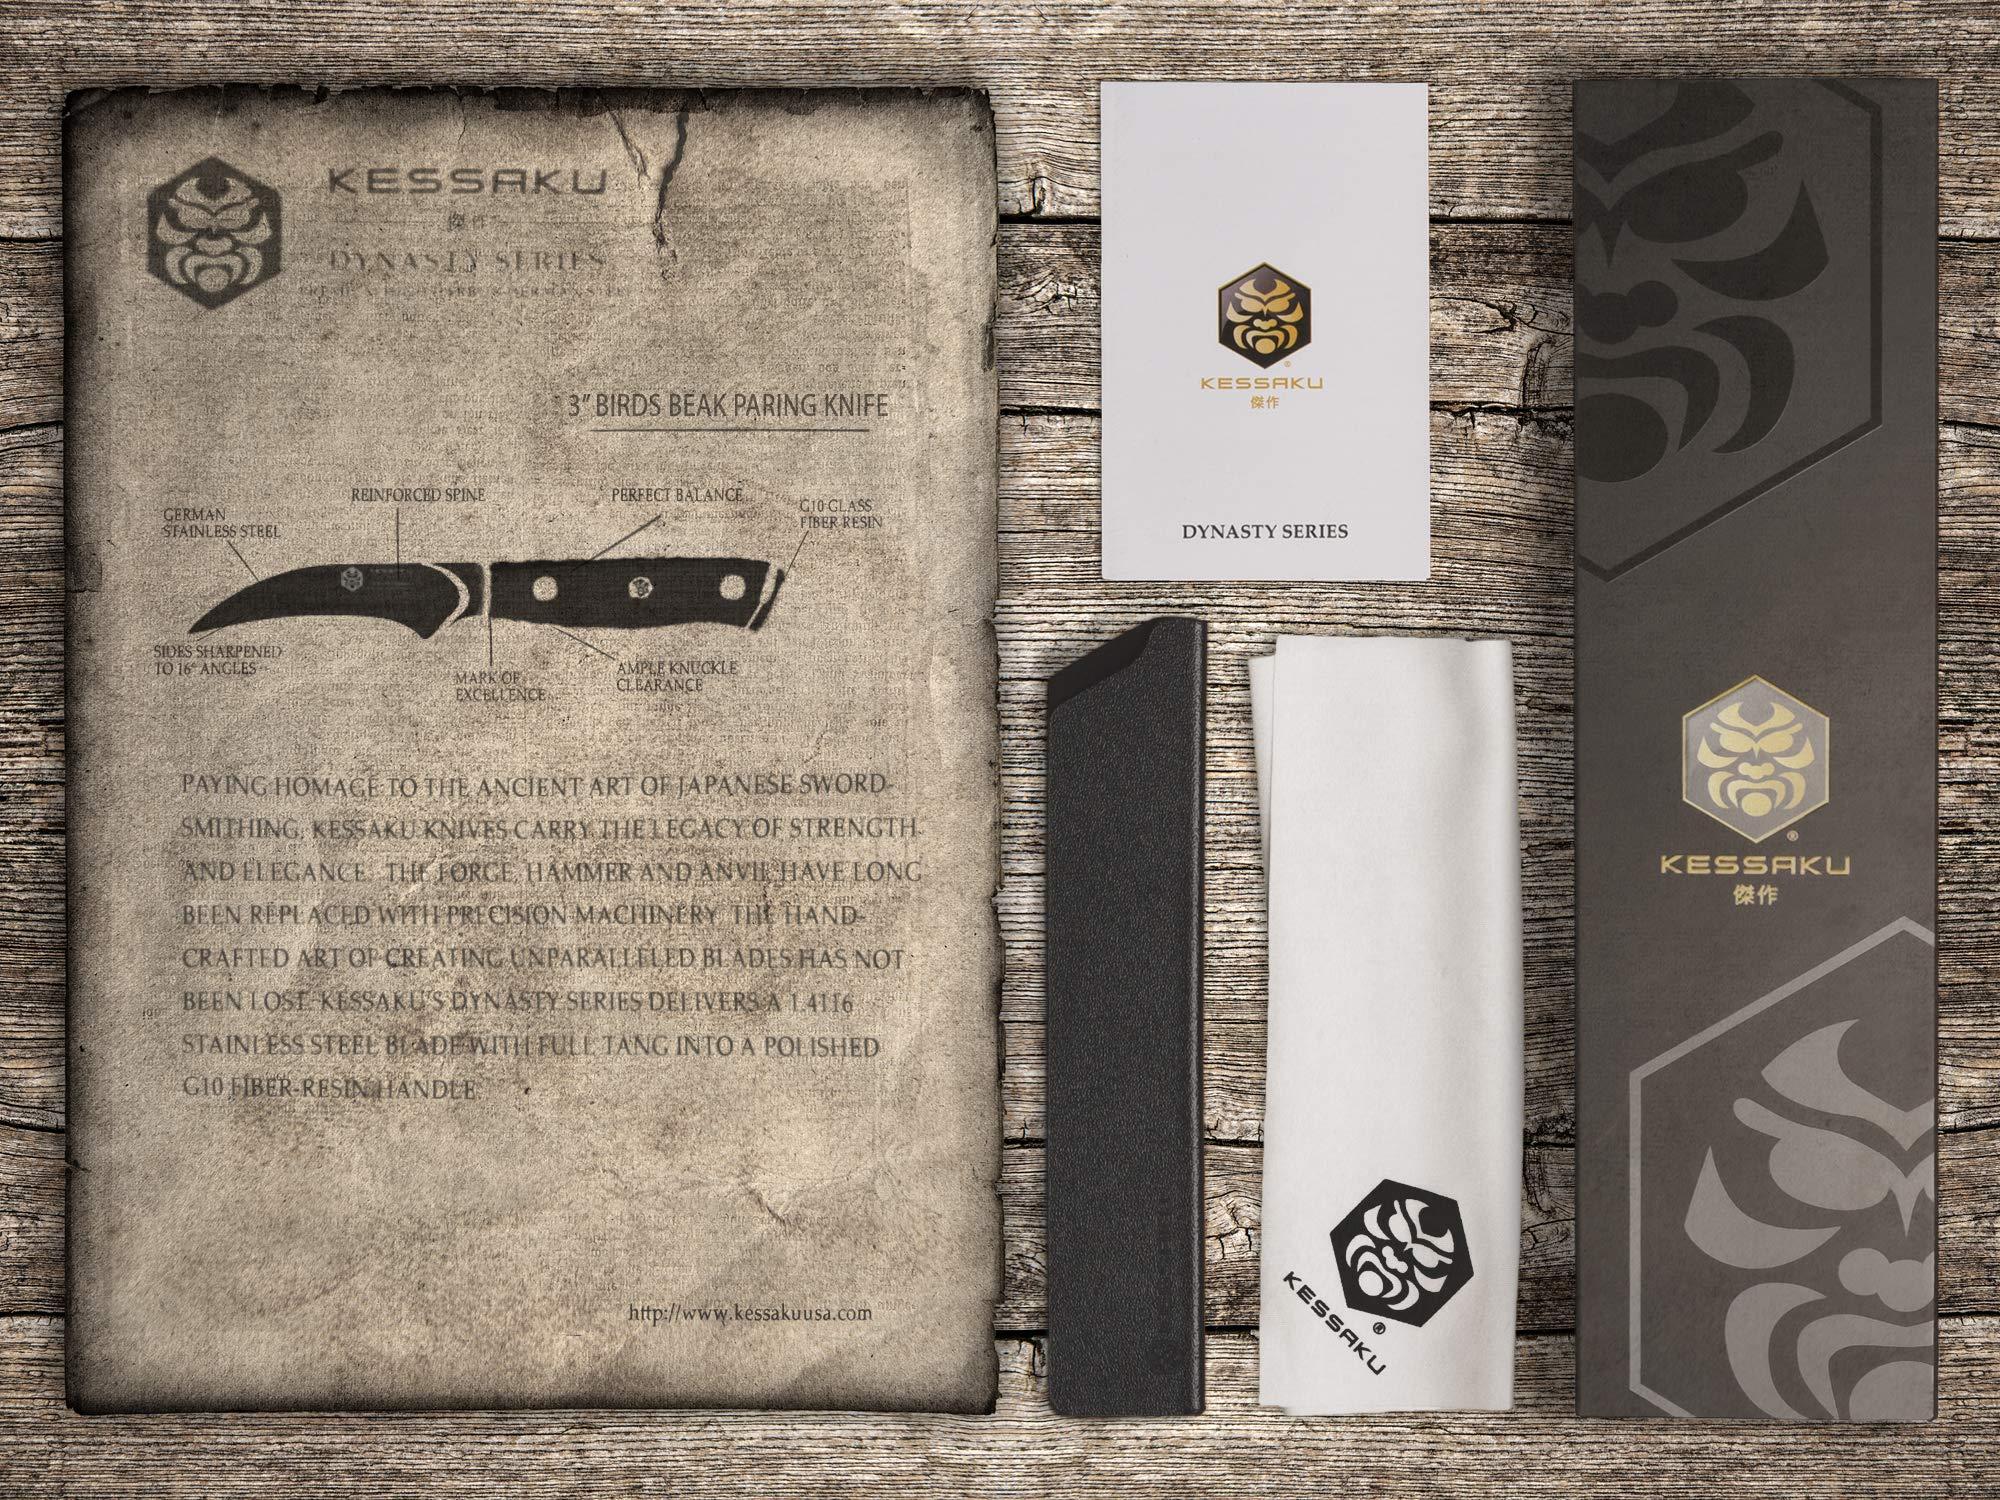 Kessaku Bird's Beak Paring Knife - Dynasty Series - German HC Steel, G10 Full Tang Handle, 3-Inch by Kessaku (Image #5)